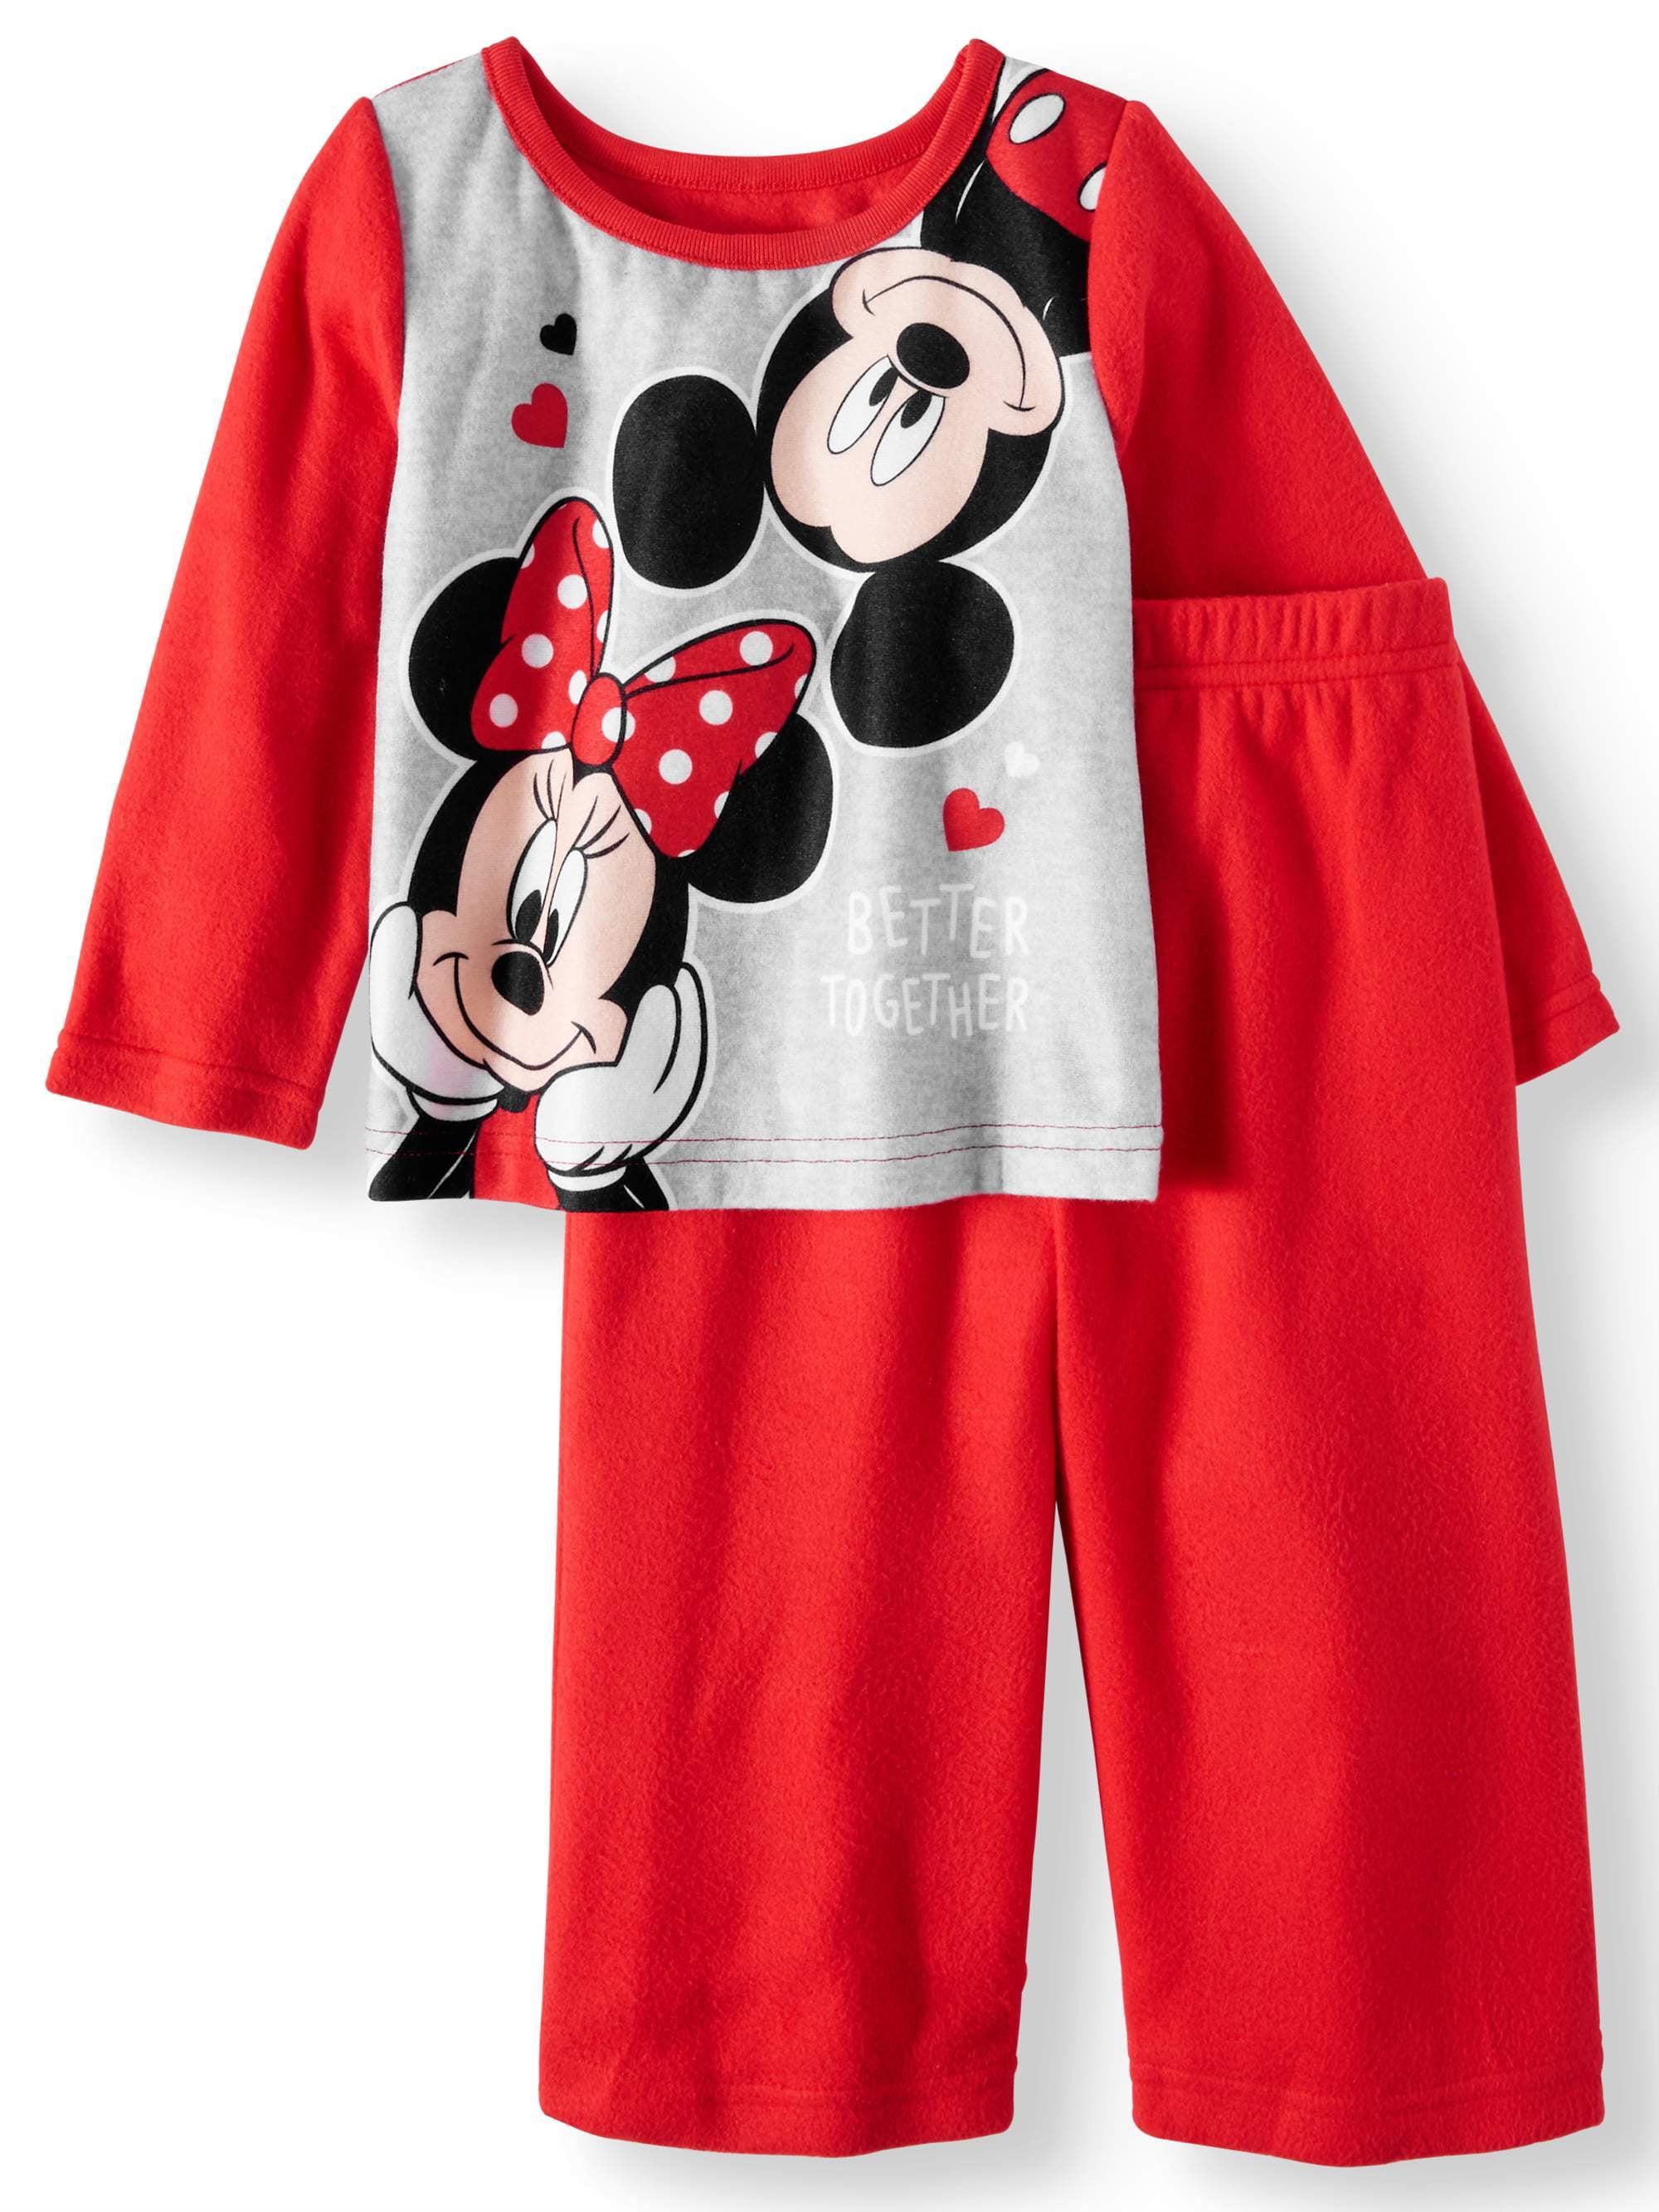 Minnie Mouse Pajamas, 2pc Set (Baby Girls & Toddler Girls)